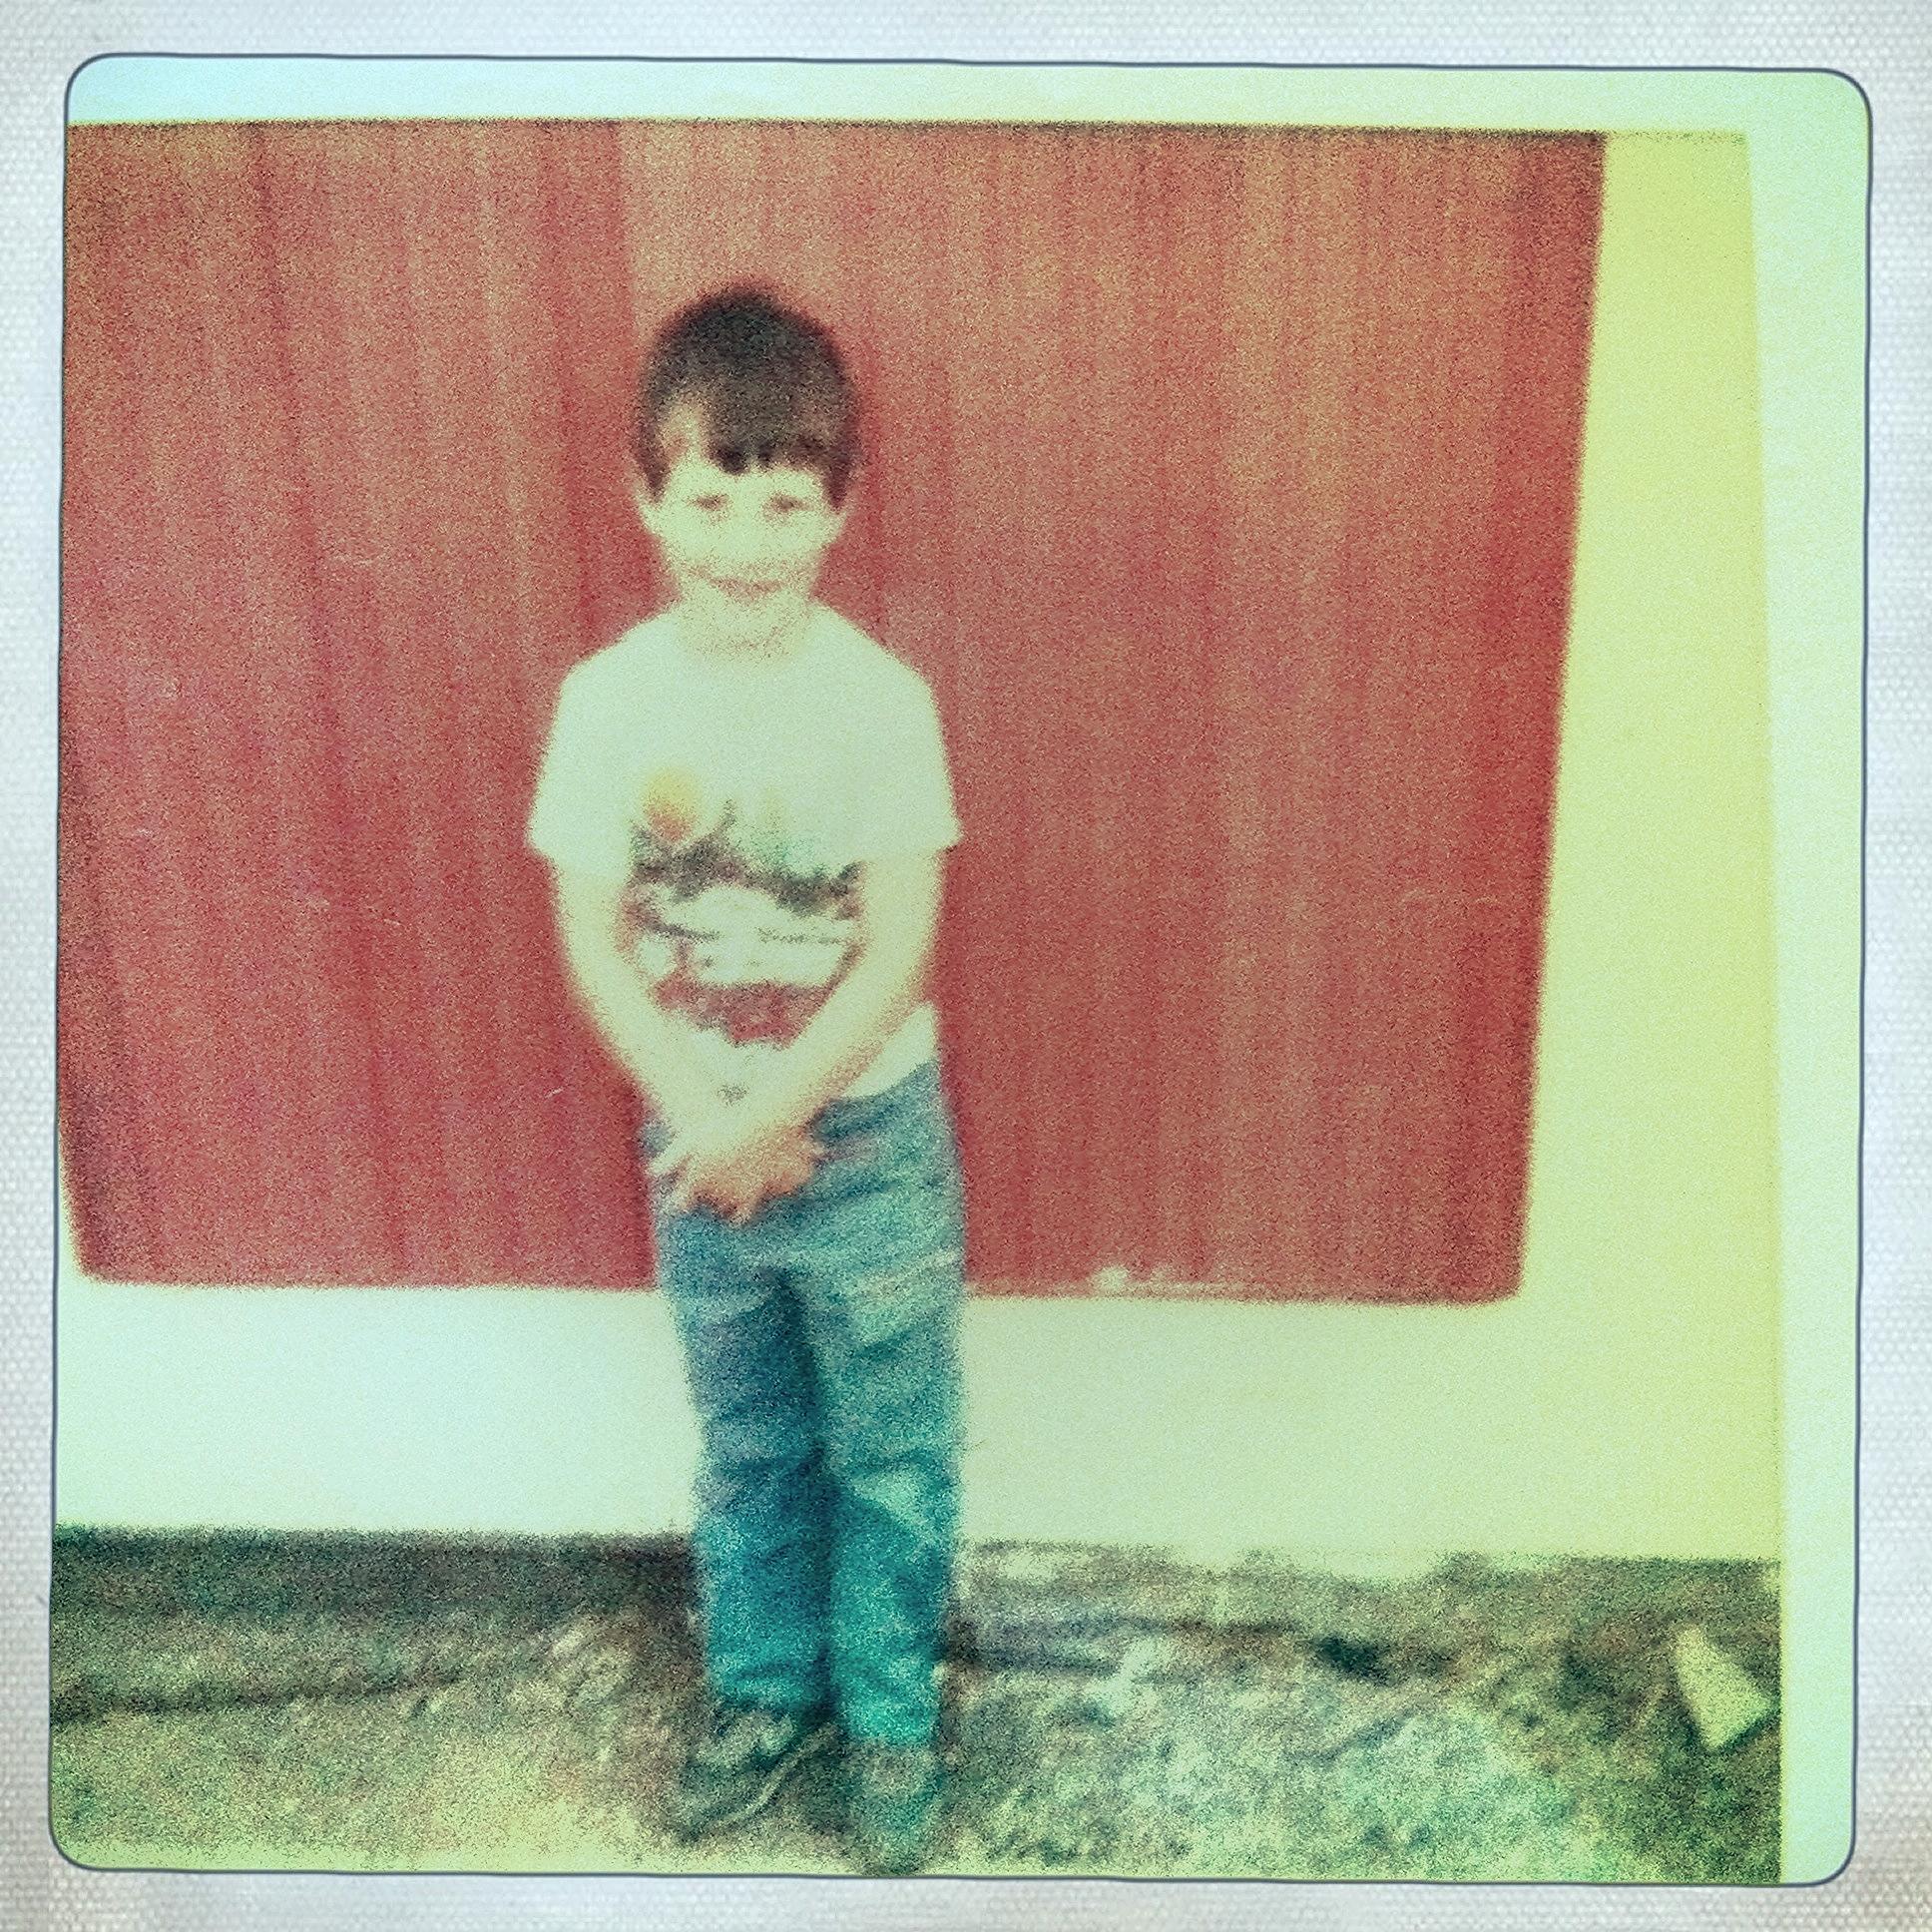 Michael,  circa 1985, the daynew baby brother, Ryan comes home